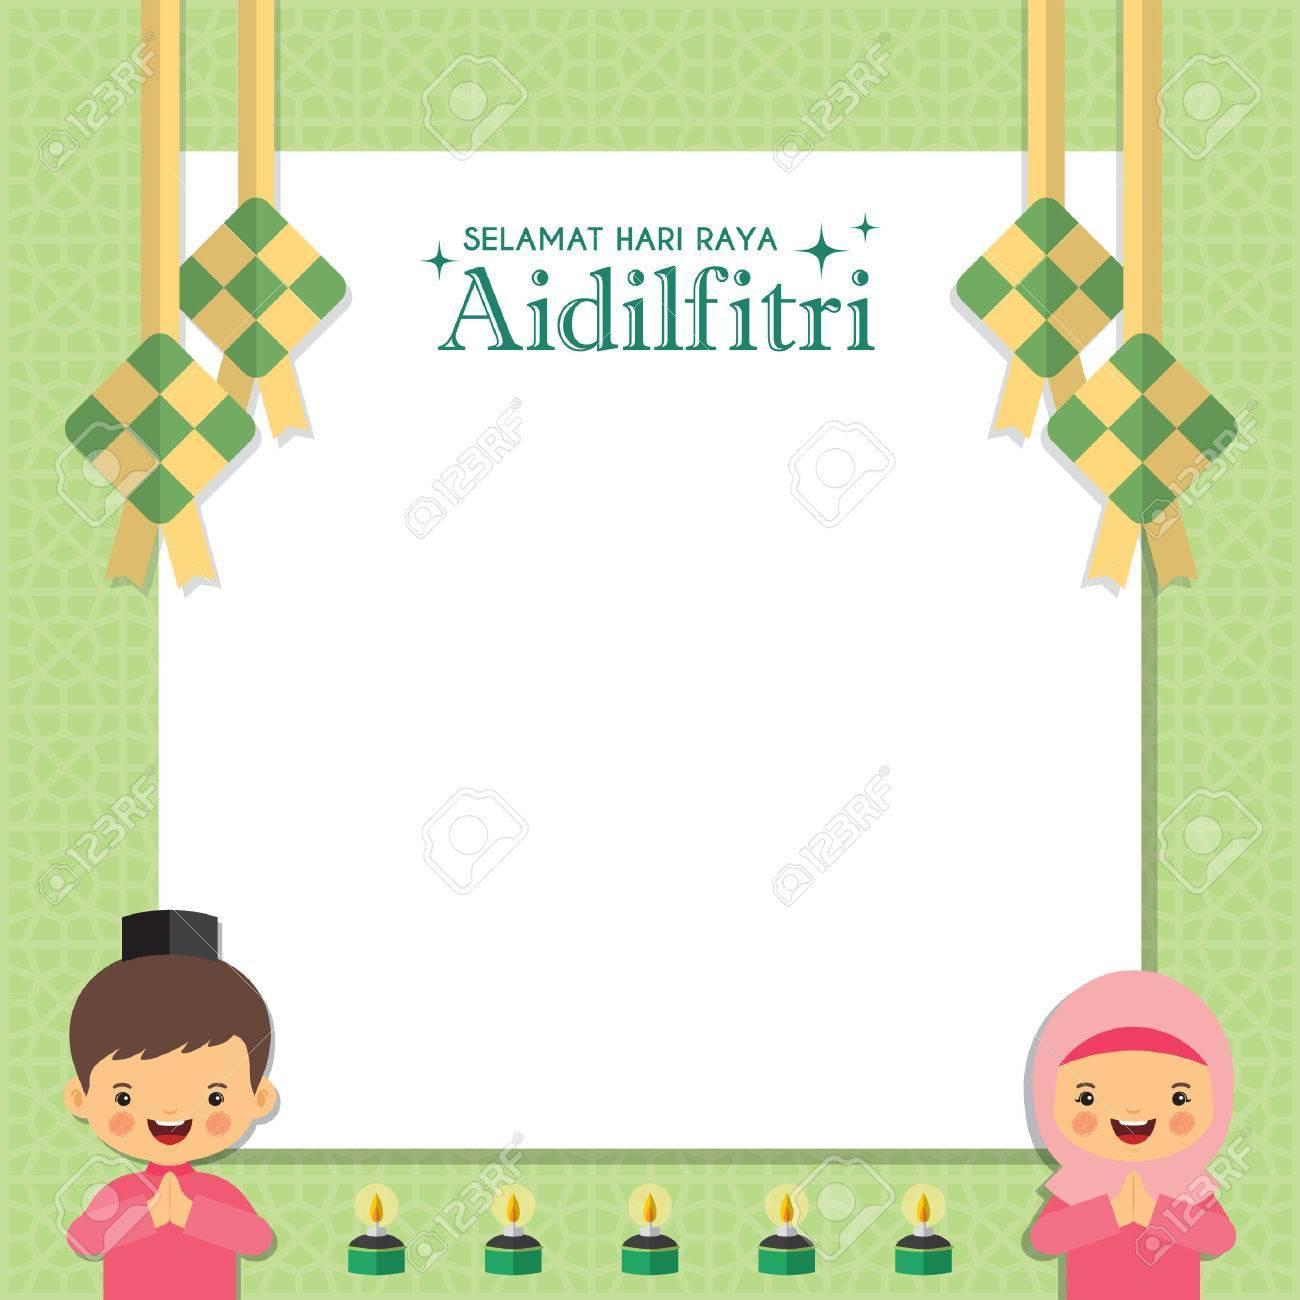 Hari Raya Frame Photo For Android Apk Download